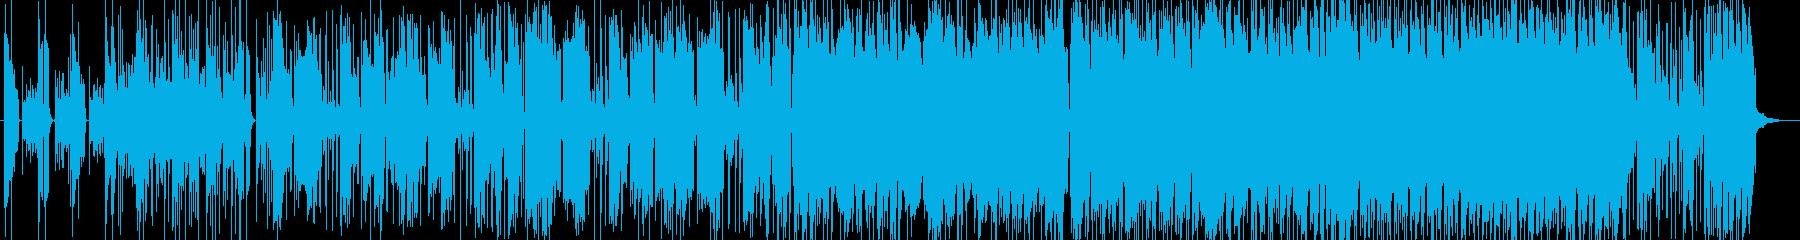 EGT、情熱的なポップロックのんの再生済みの波形